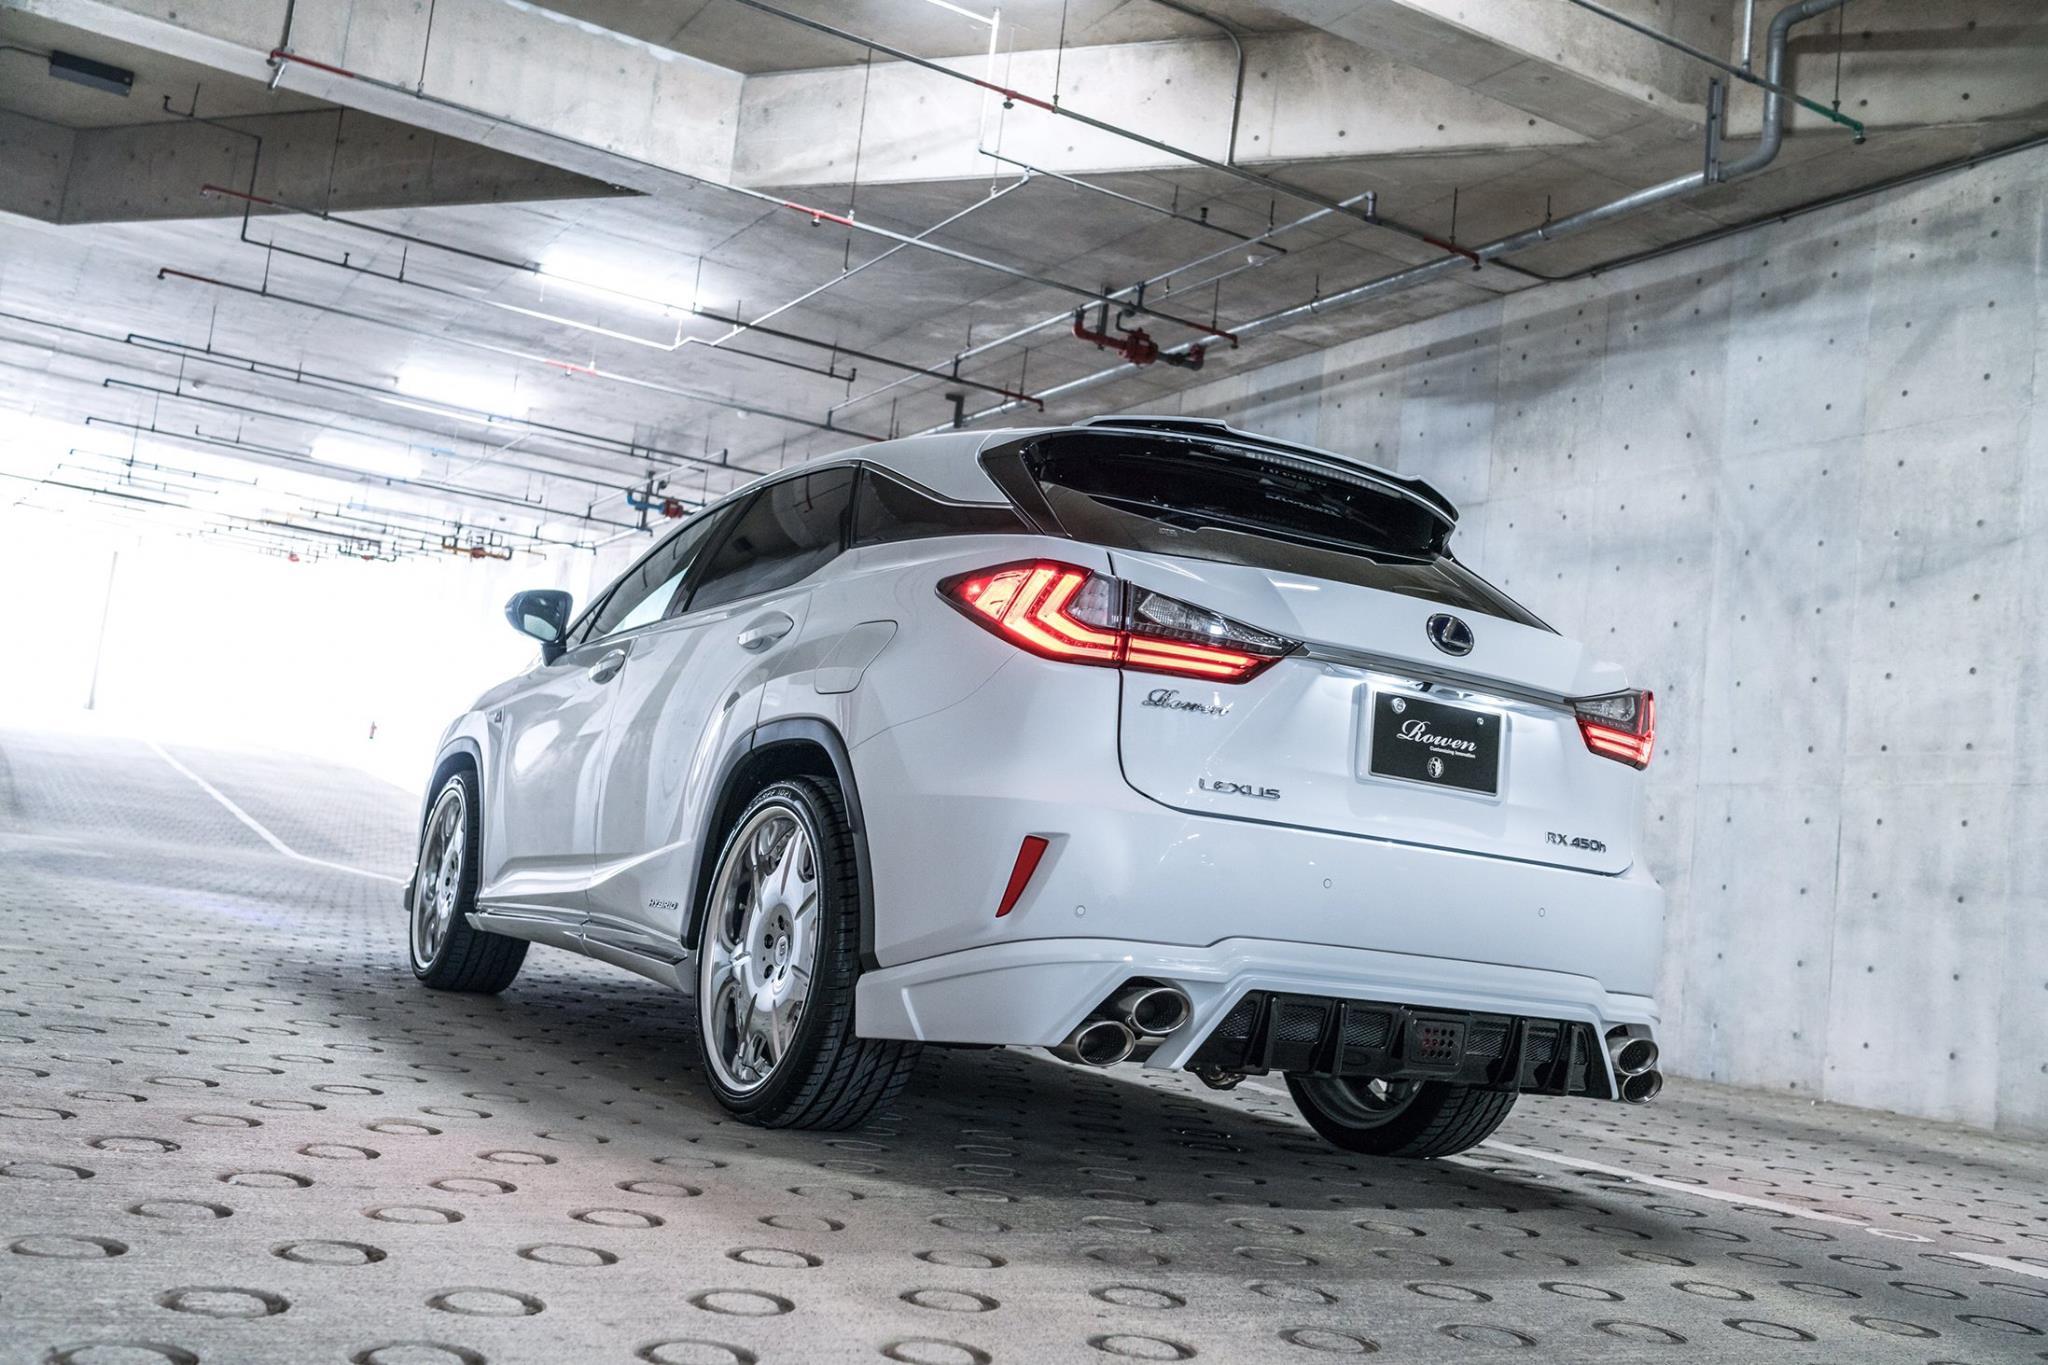 Lexus Rx F Sport With Rowen Body Kit Has Quad Exhaust